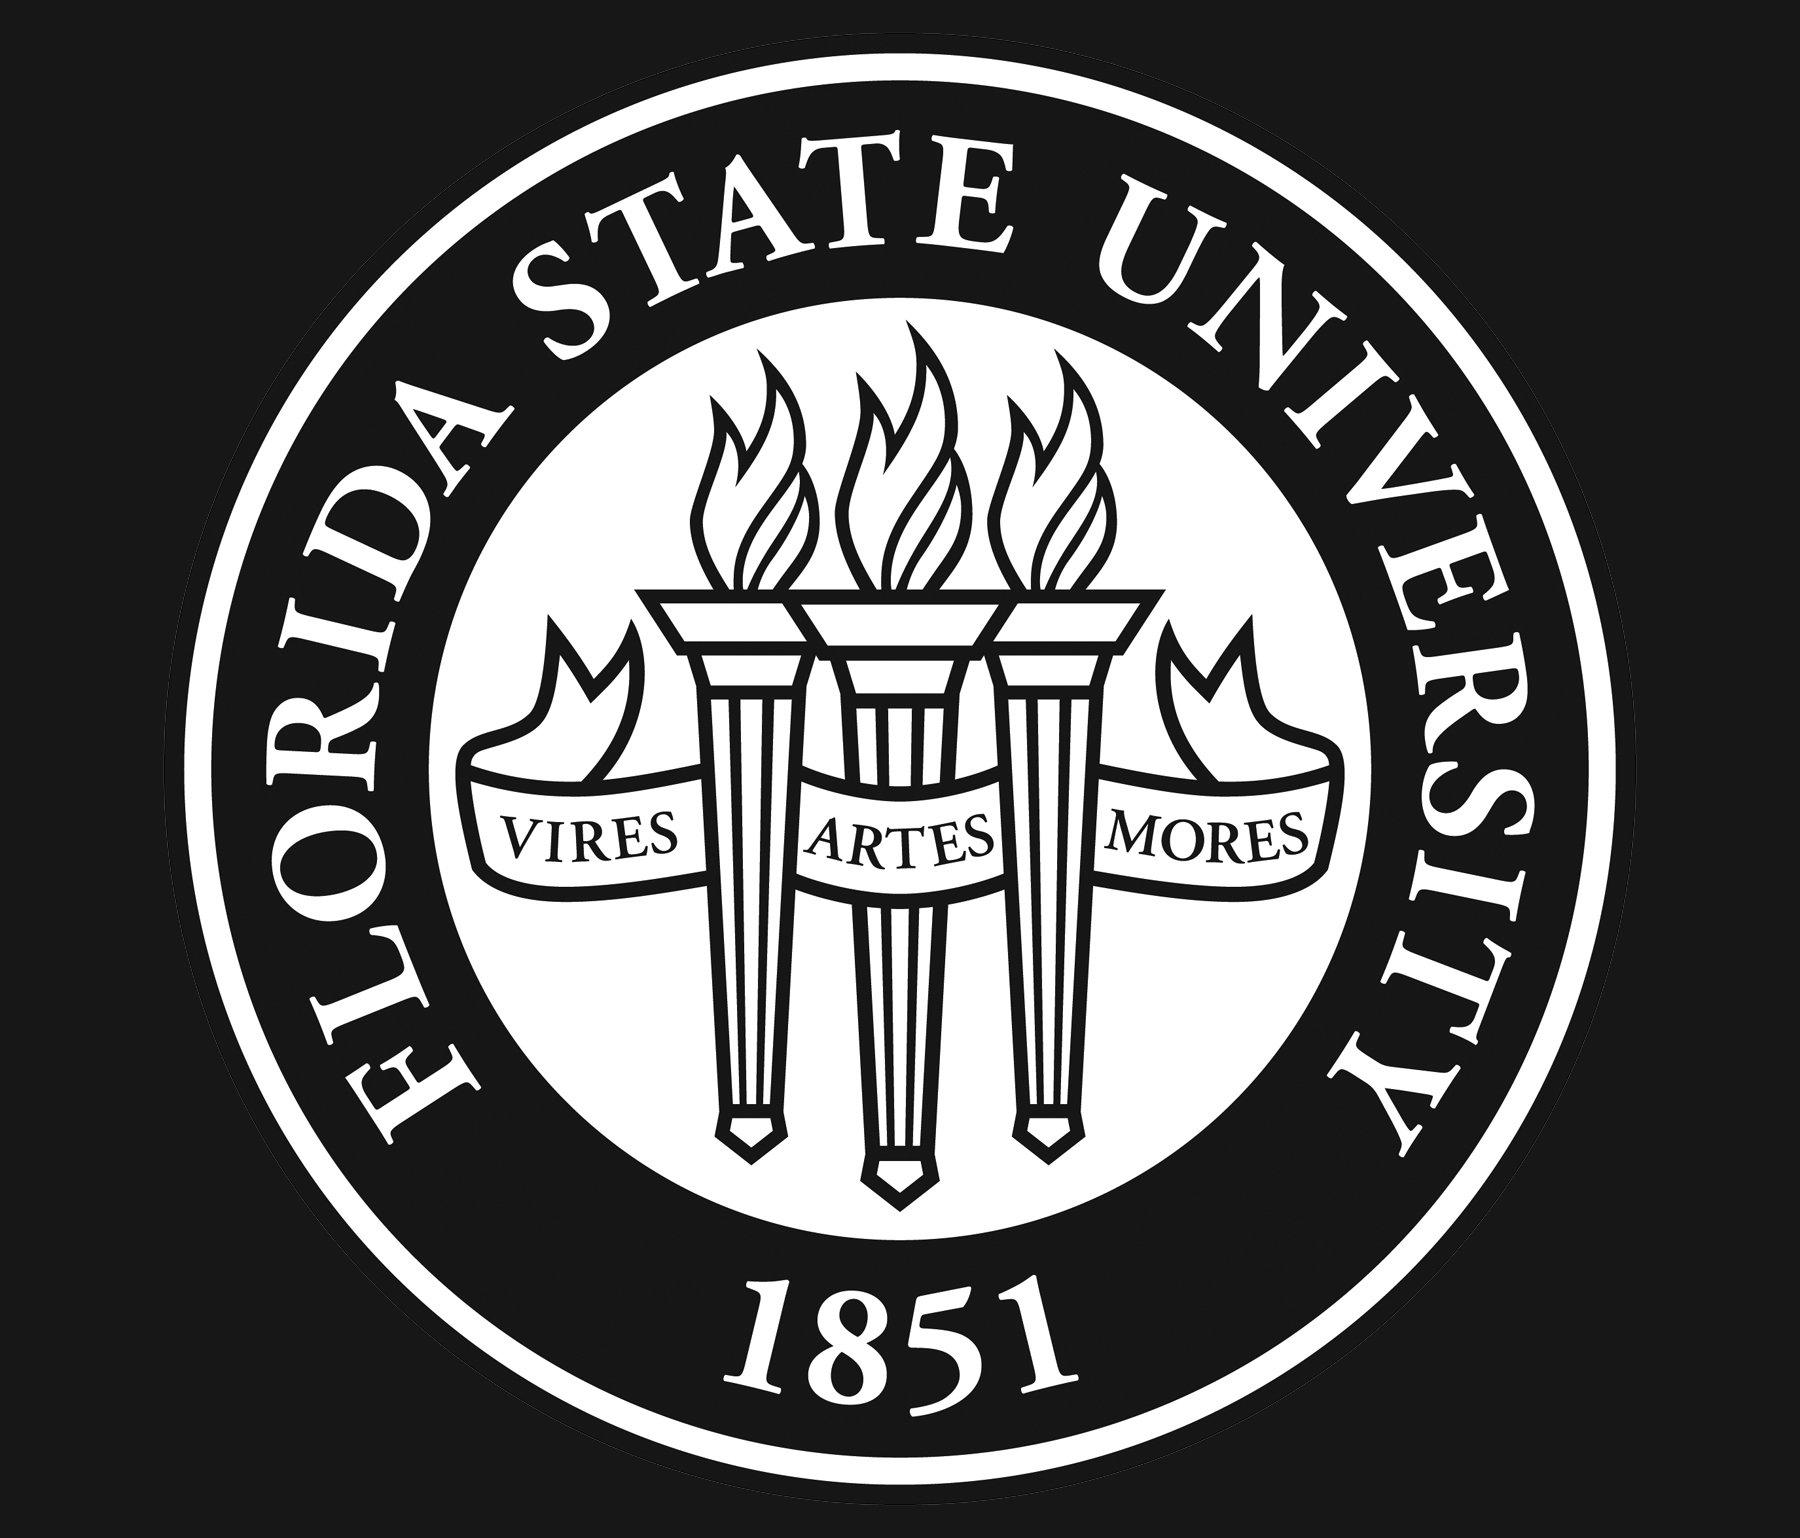 Florida state university logo florida state university symbol athletic symbols florida state university buycottarizona Gallery